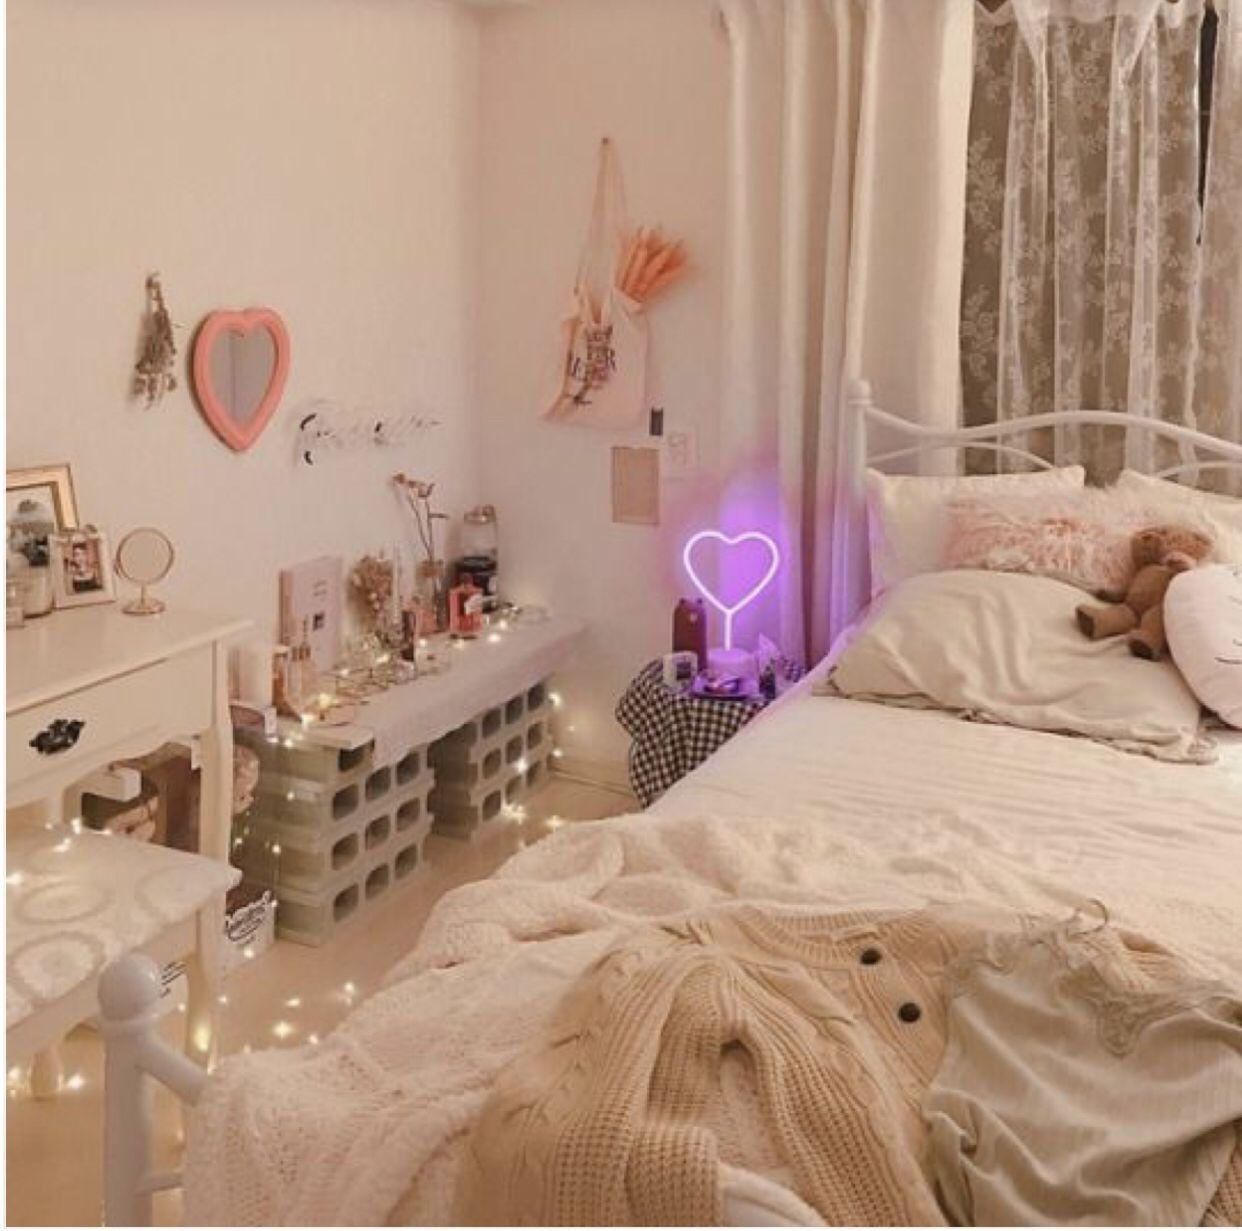 Aesthetic Bedrooms Small Idea Aesthetic Bedrooms Small Idea Design Ideas And Photos Dubai Khalifa